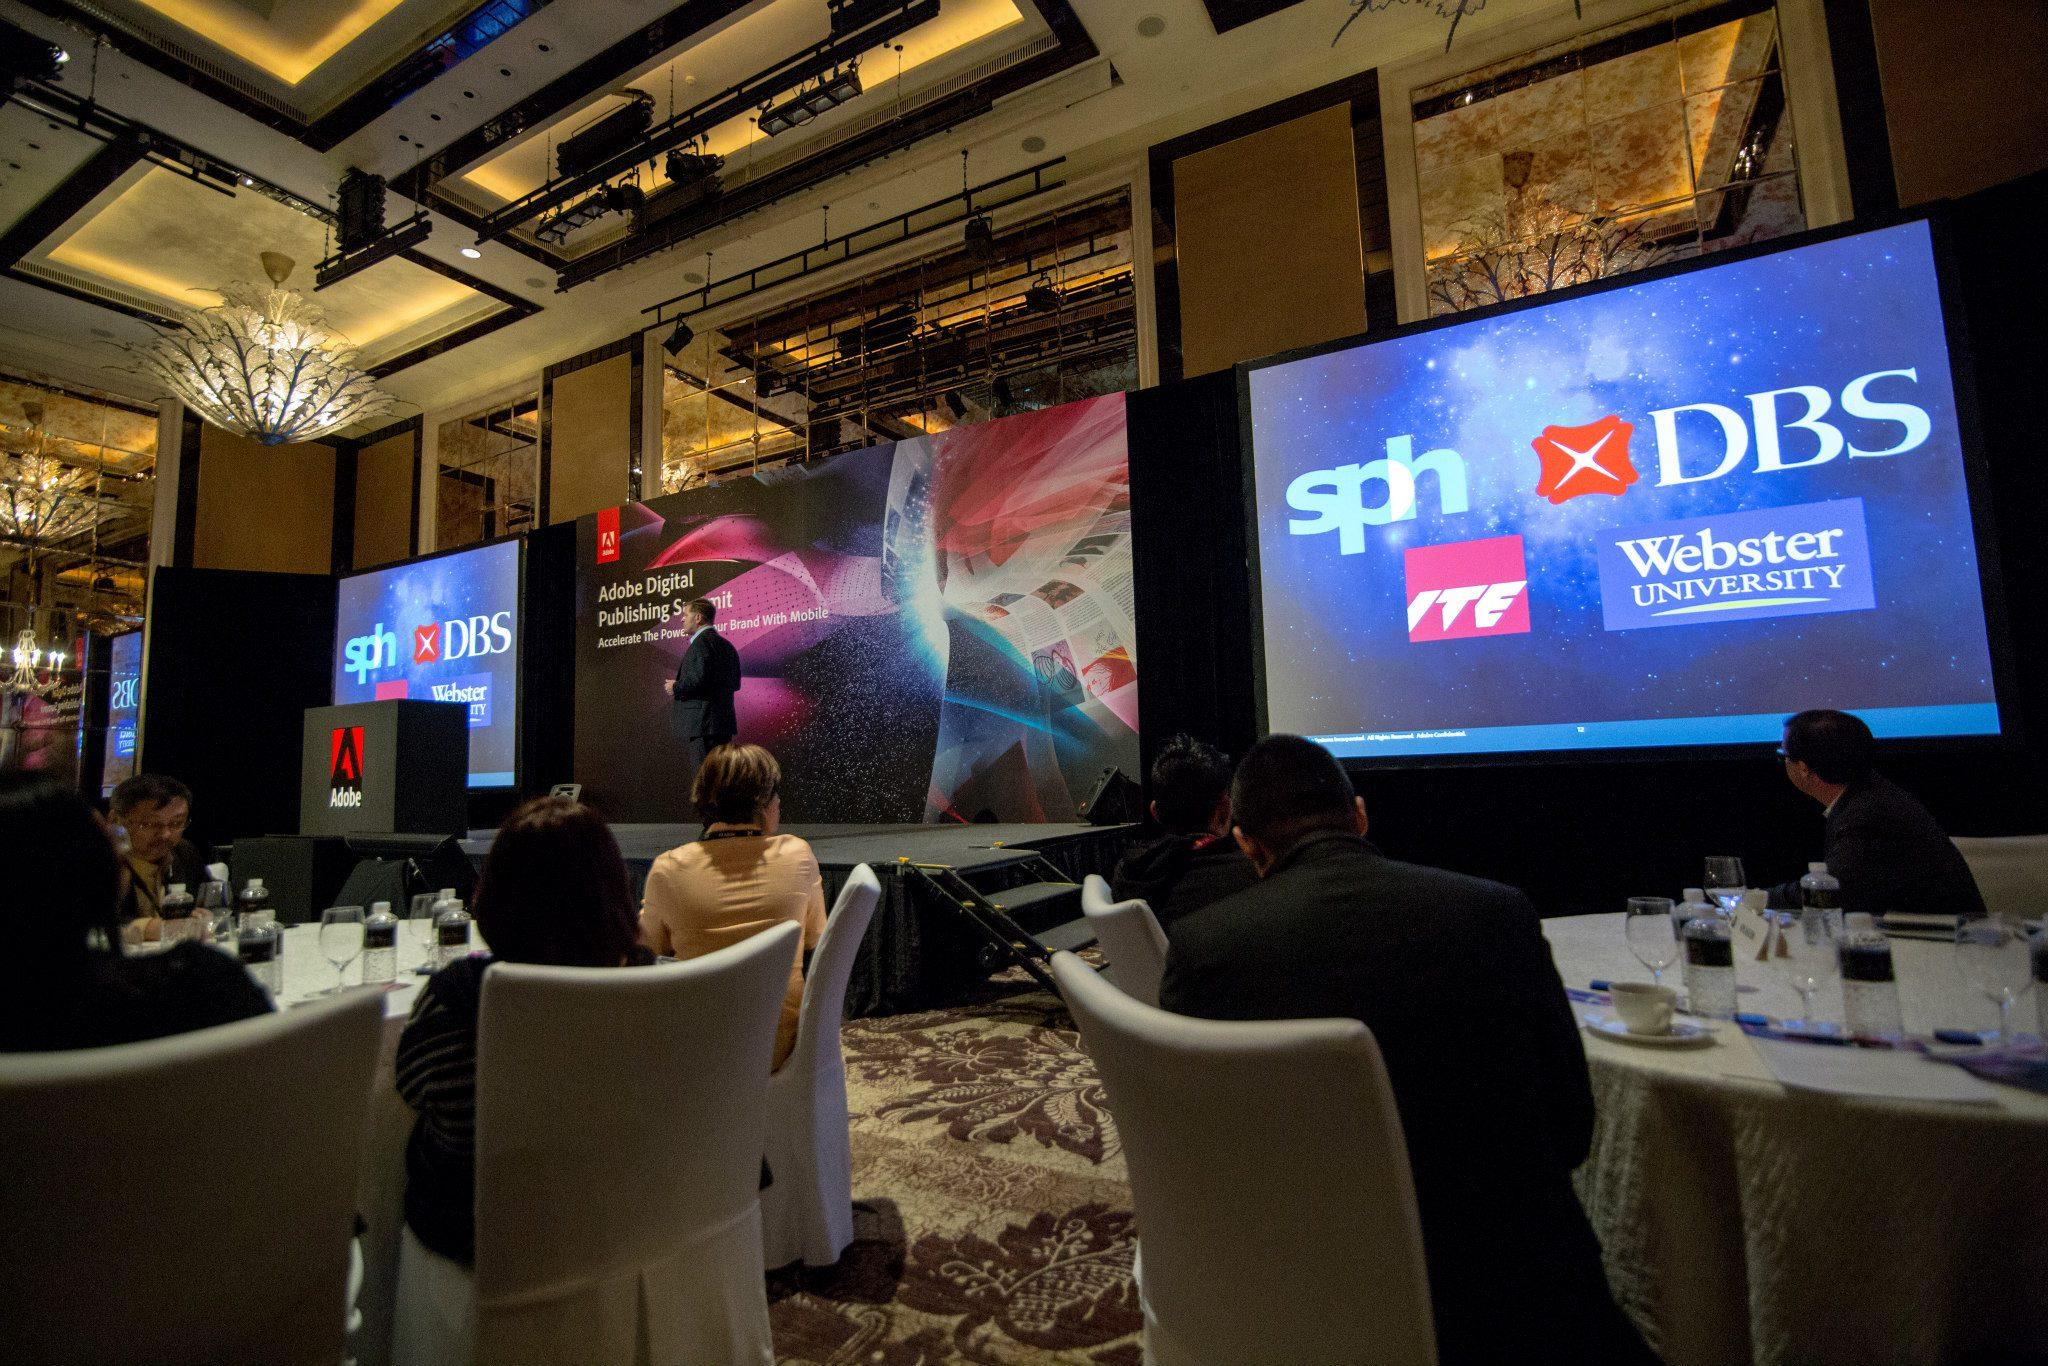 Adobe_DPS_Singapore-2.jpg